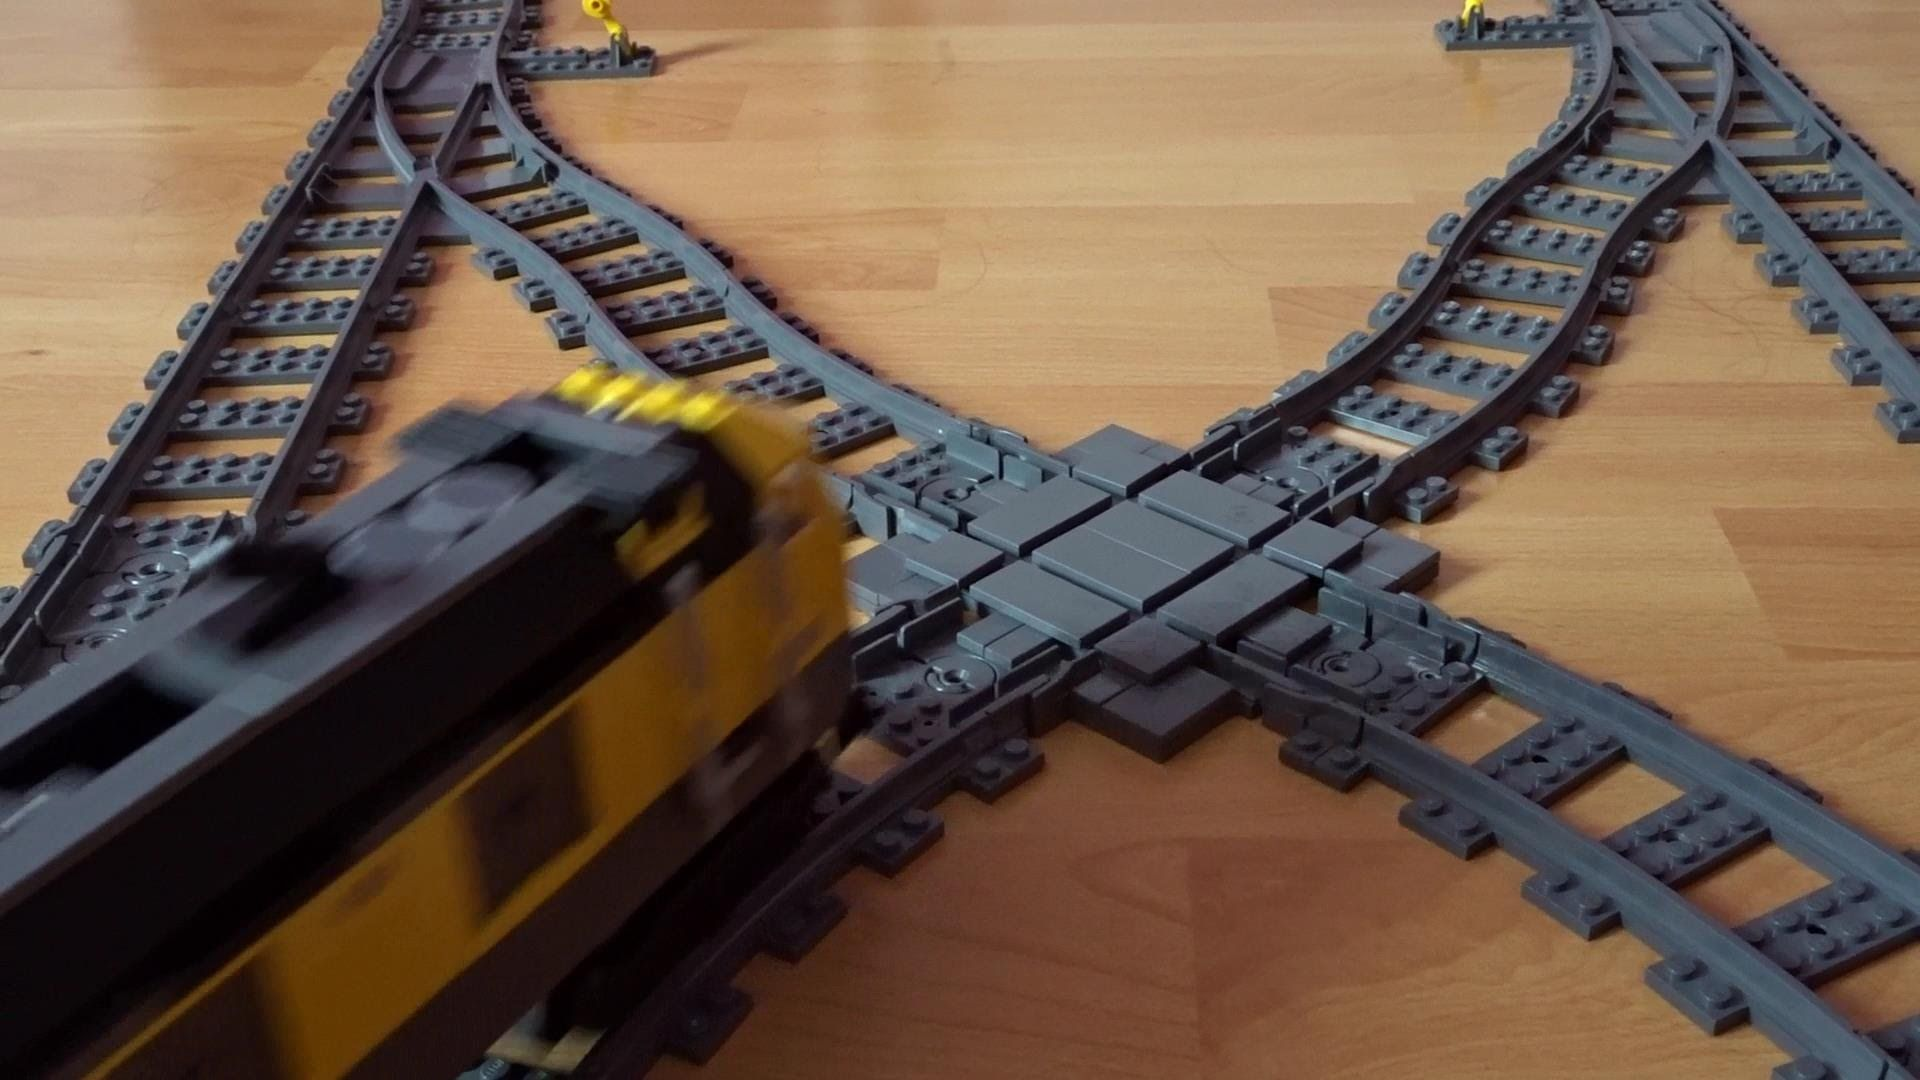 Lego Train X Cross Tutorial Lego Train Fabrication D Un Croisement Lego City Zug Eisenbahn Kreuzung Selbst Gebaut Tu Projets De Lego Idees Lego Train Lego City